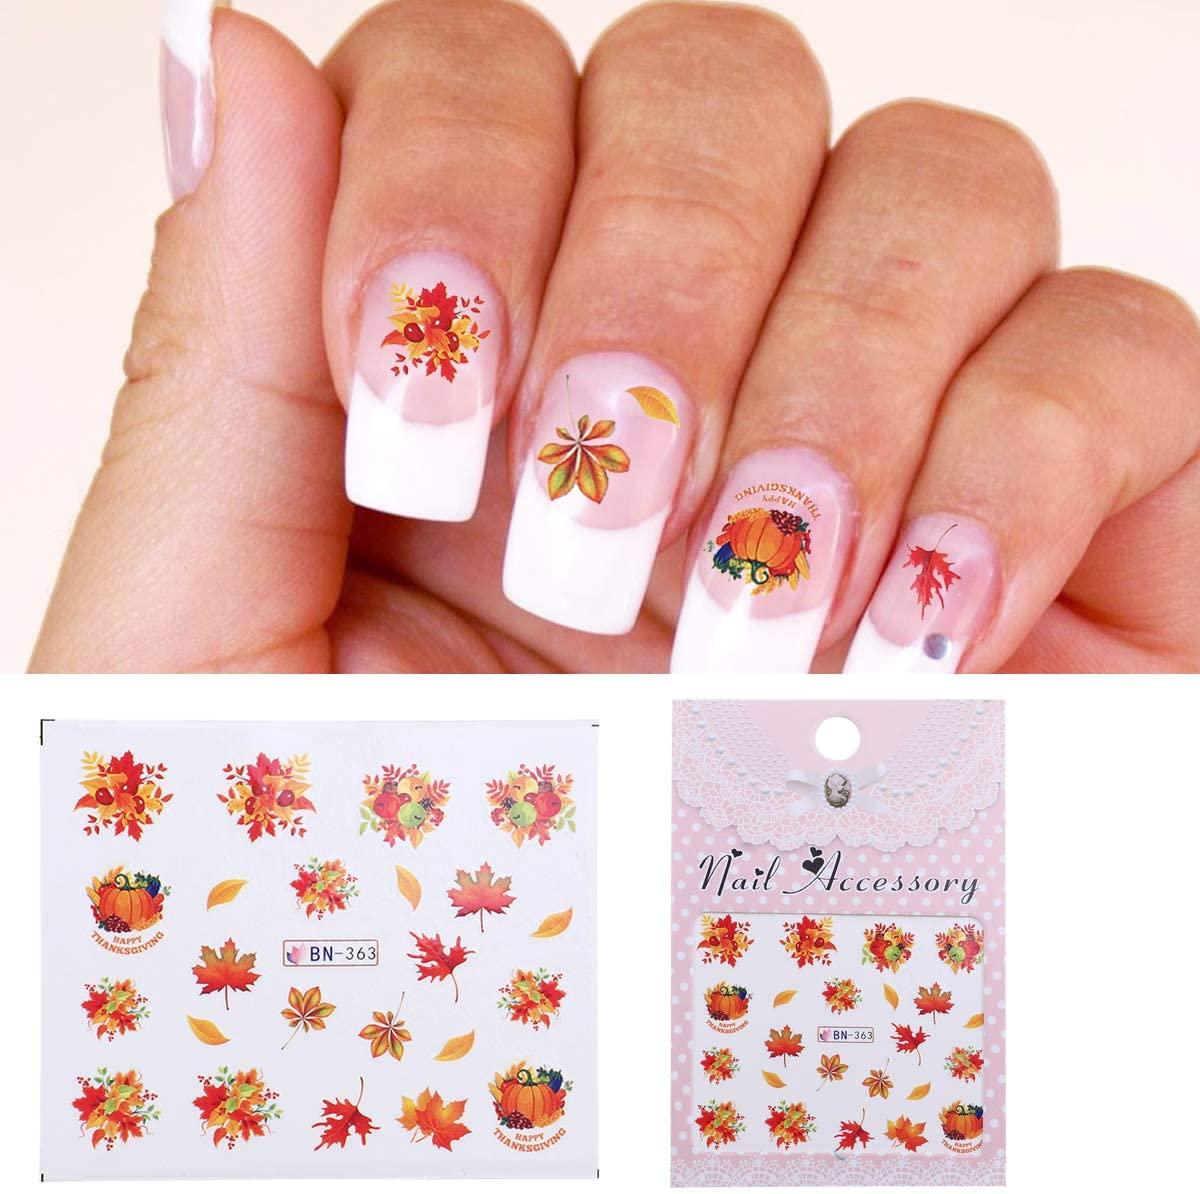 Thanksgiving Nail Art Sticker DIY Nail Polish Stickers 3D Nail Decals Self-Adhesive Tip Stickers, 10 Sheets